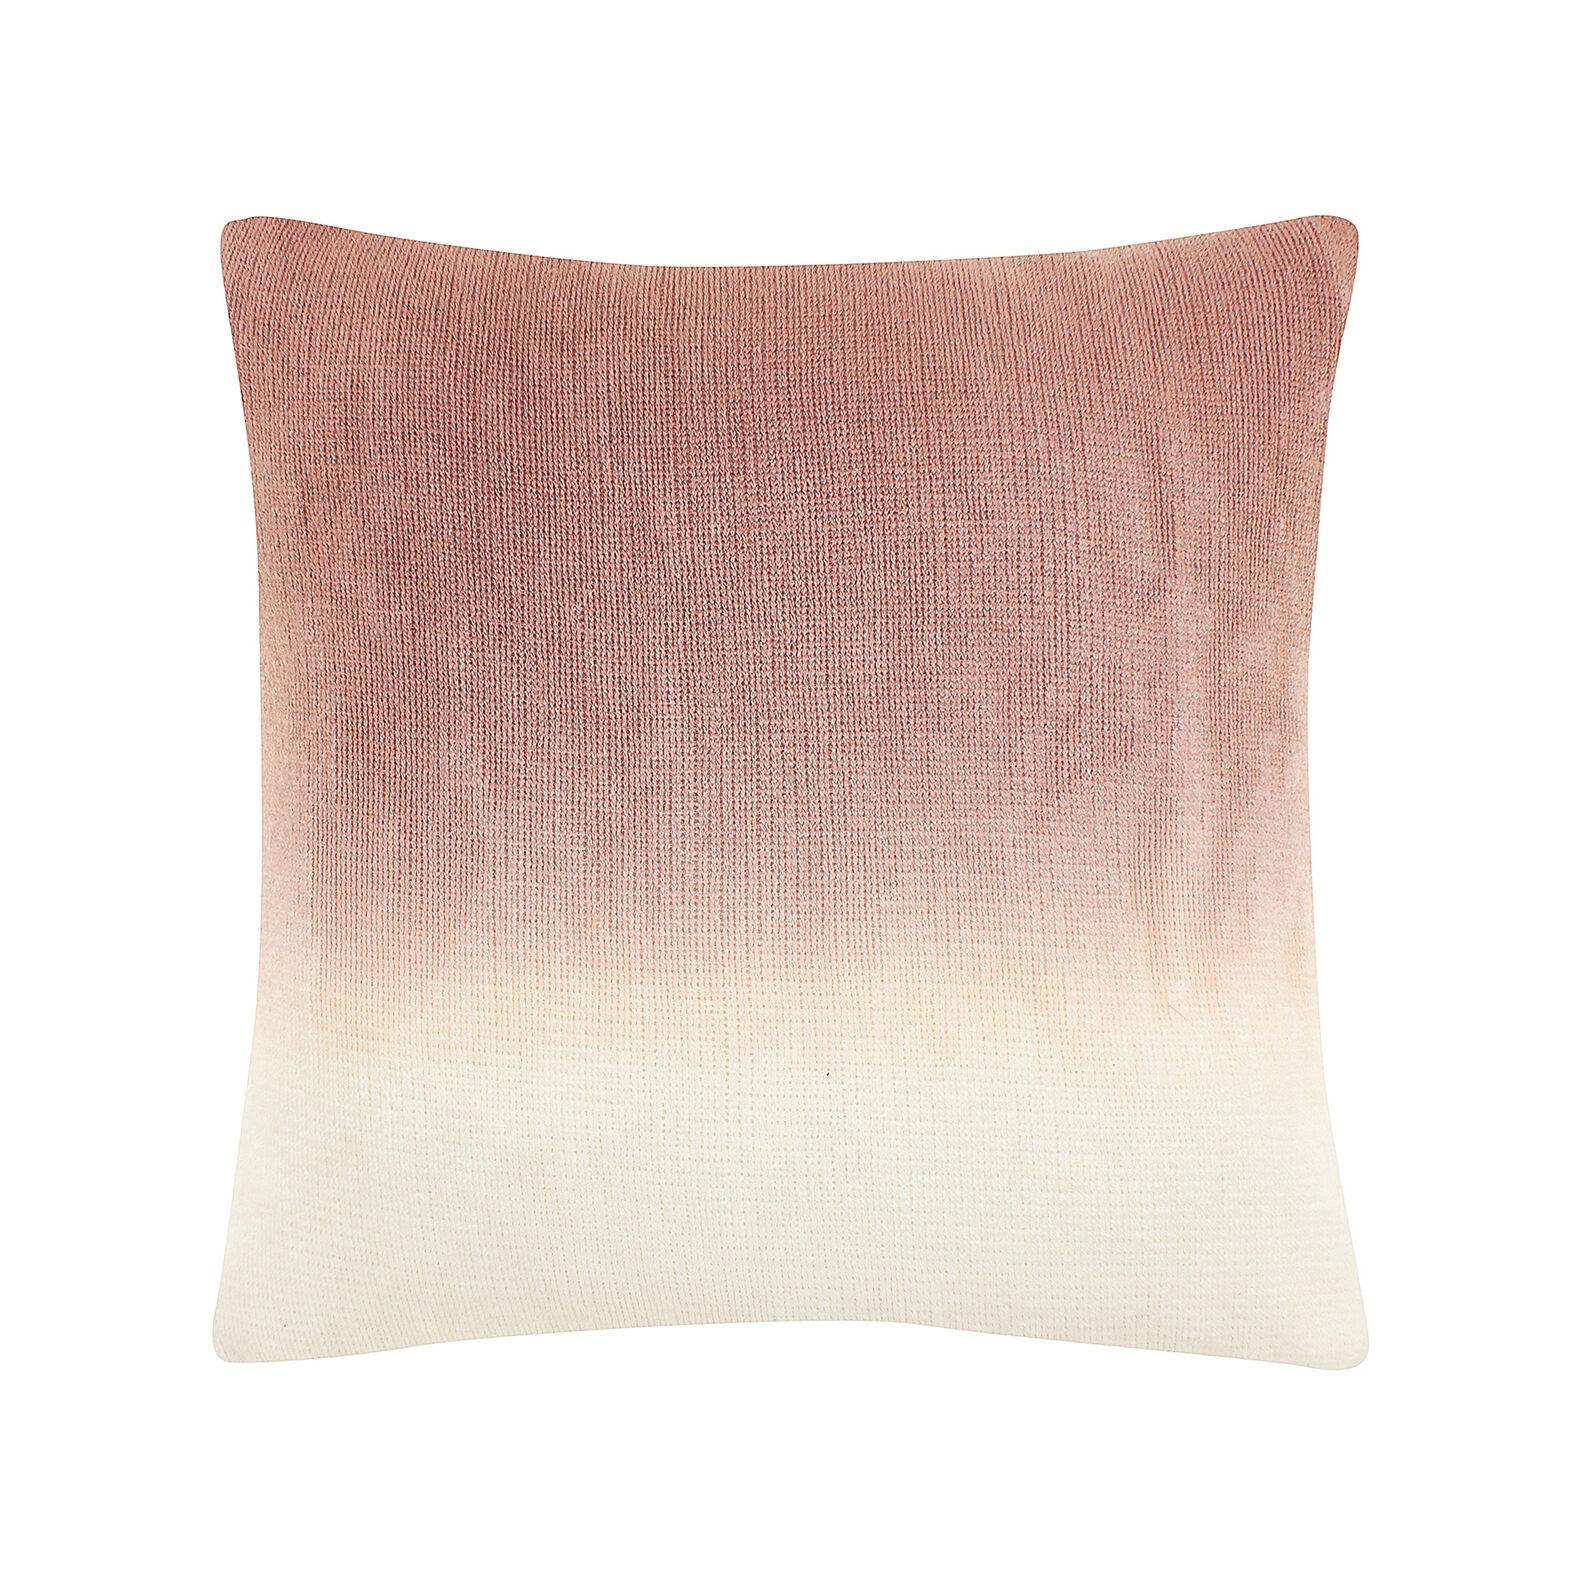 Cuscino effetto lana sfumata